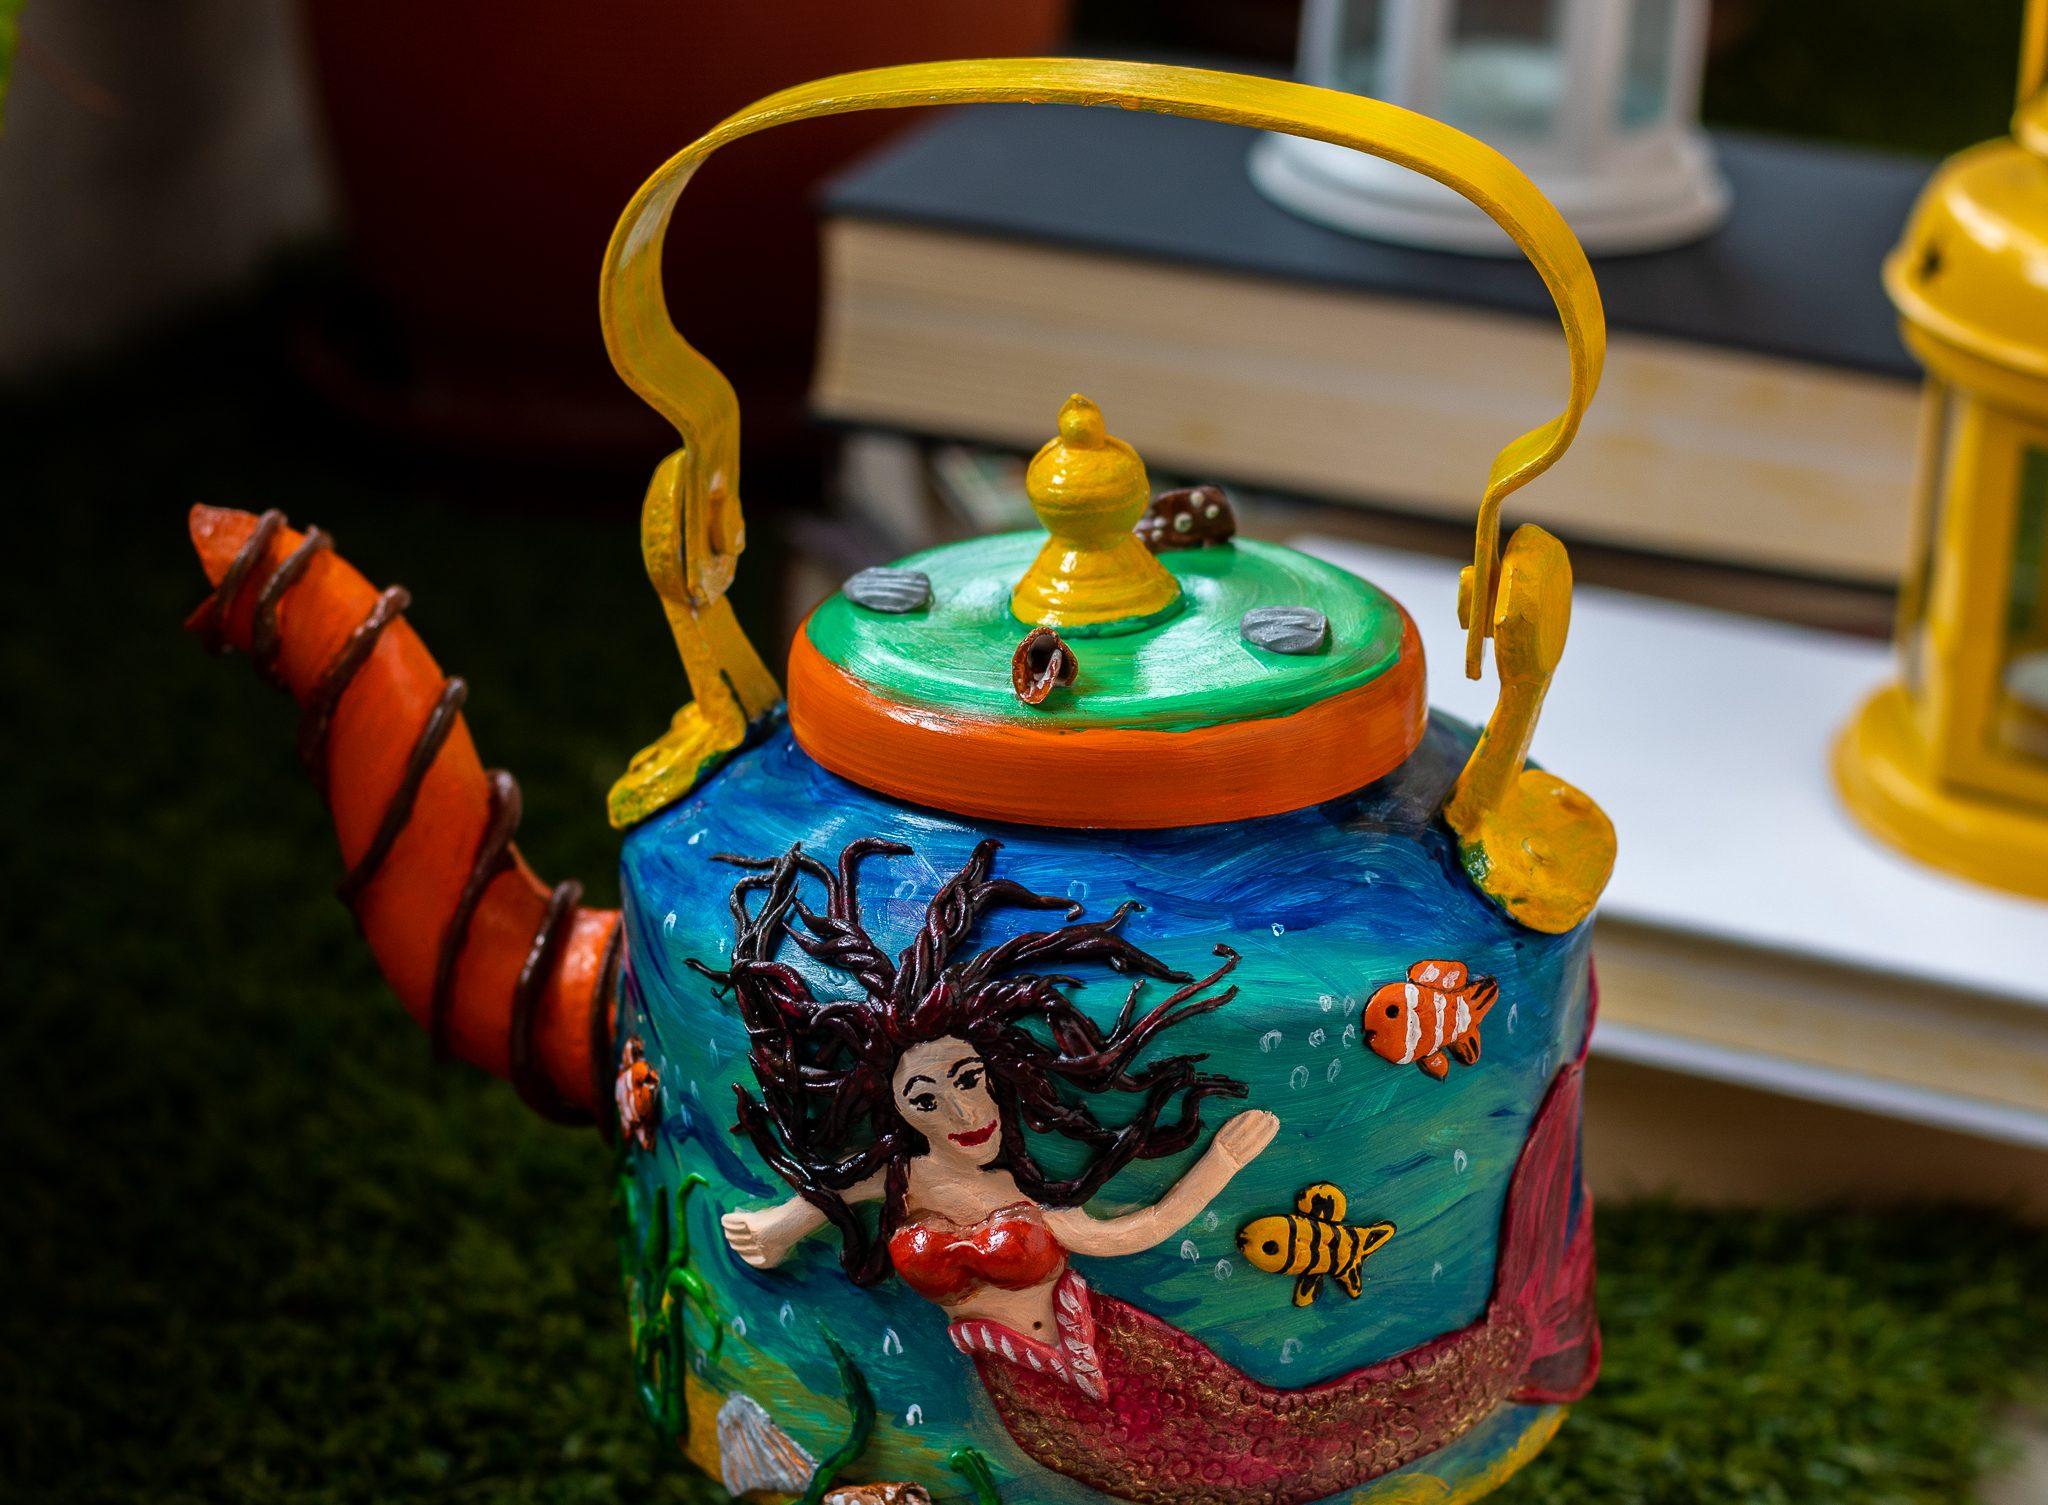 Creative Corner Mermaid Themed Decorative Kettle  Mermaid Themed Decorative Kettle